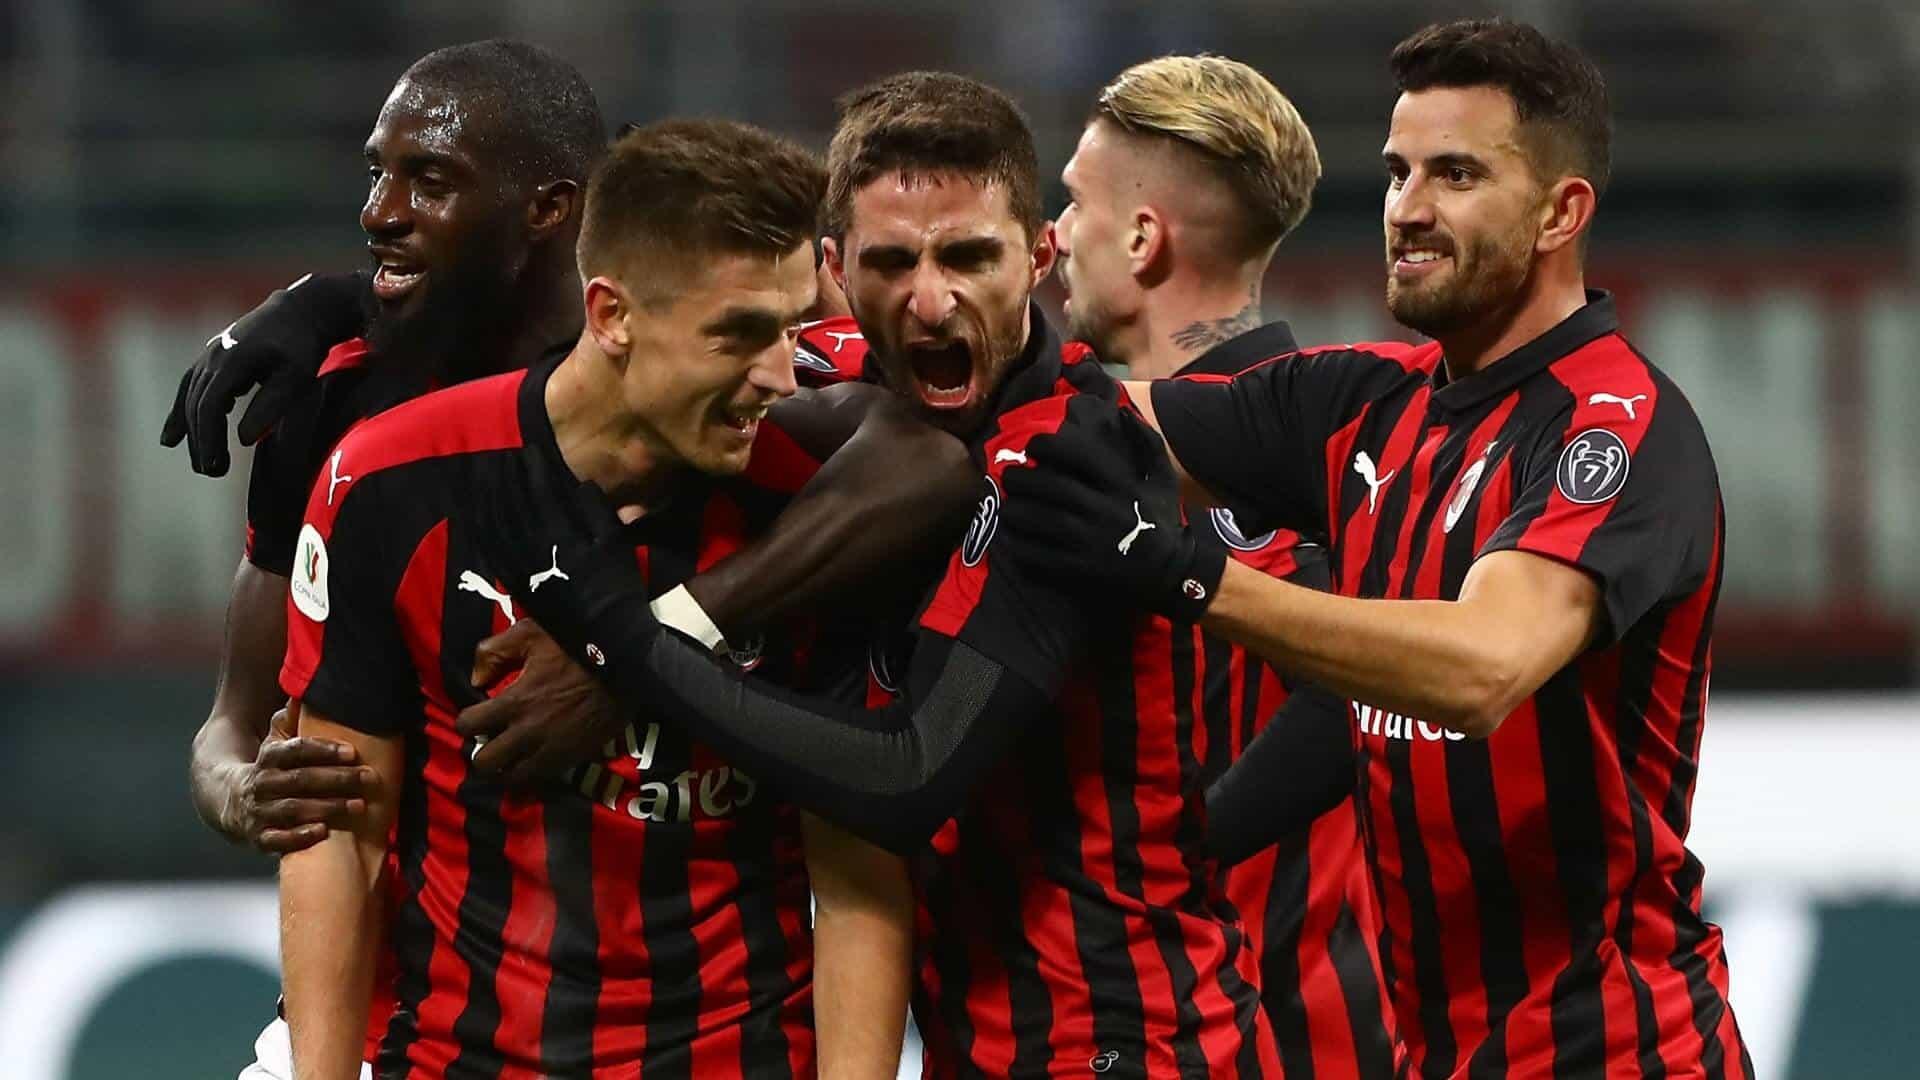 ac milan fc soccer team 2019